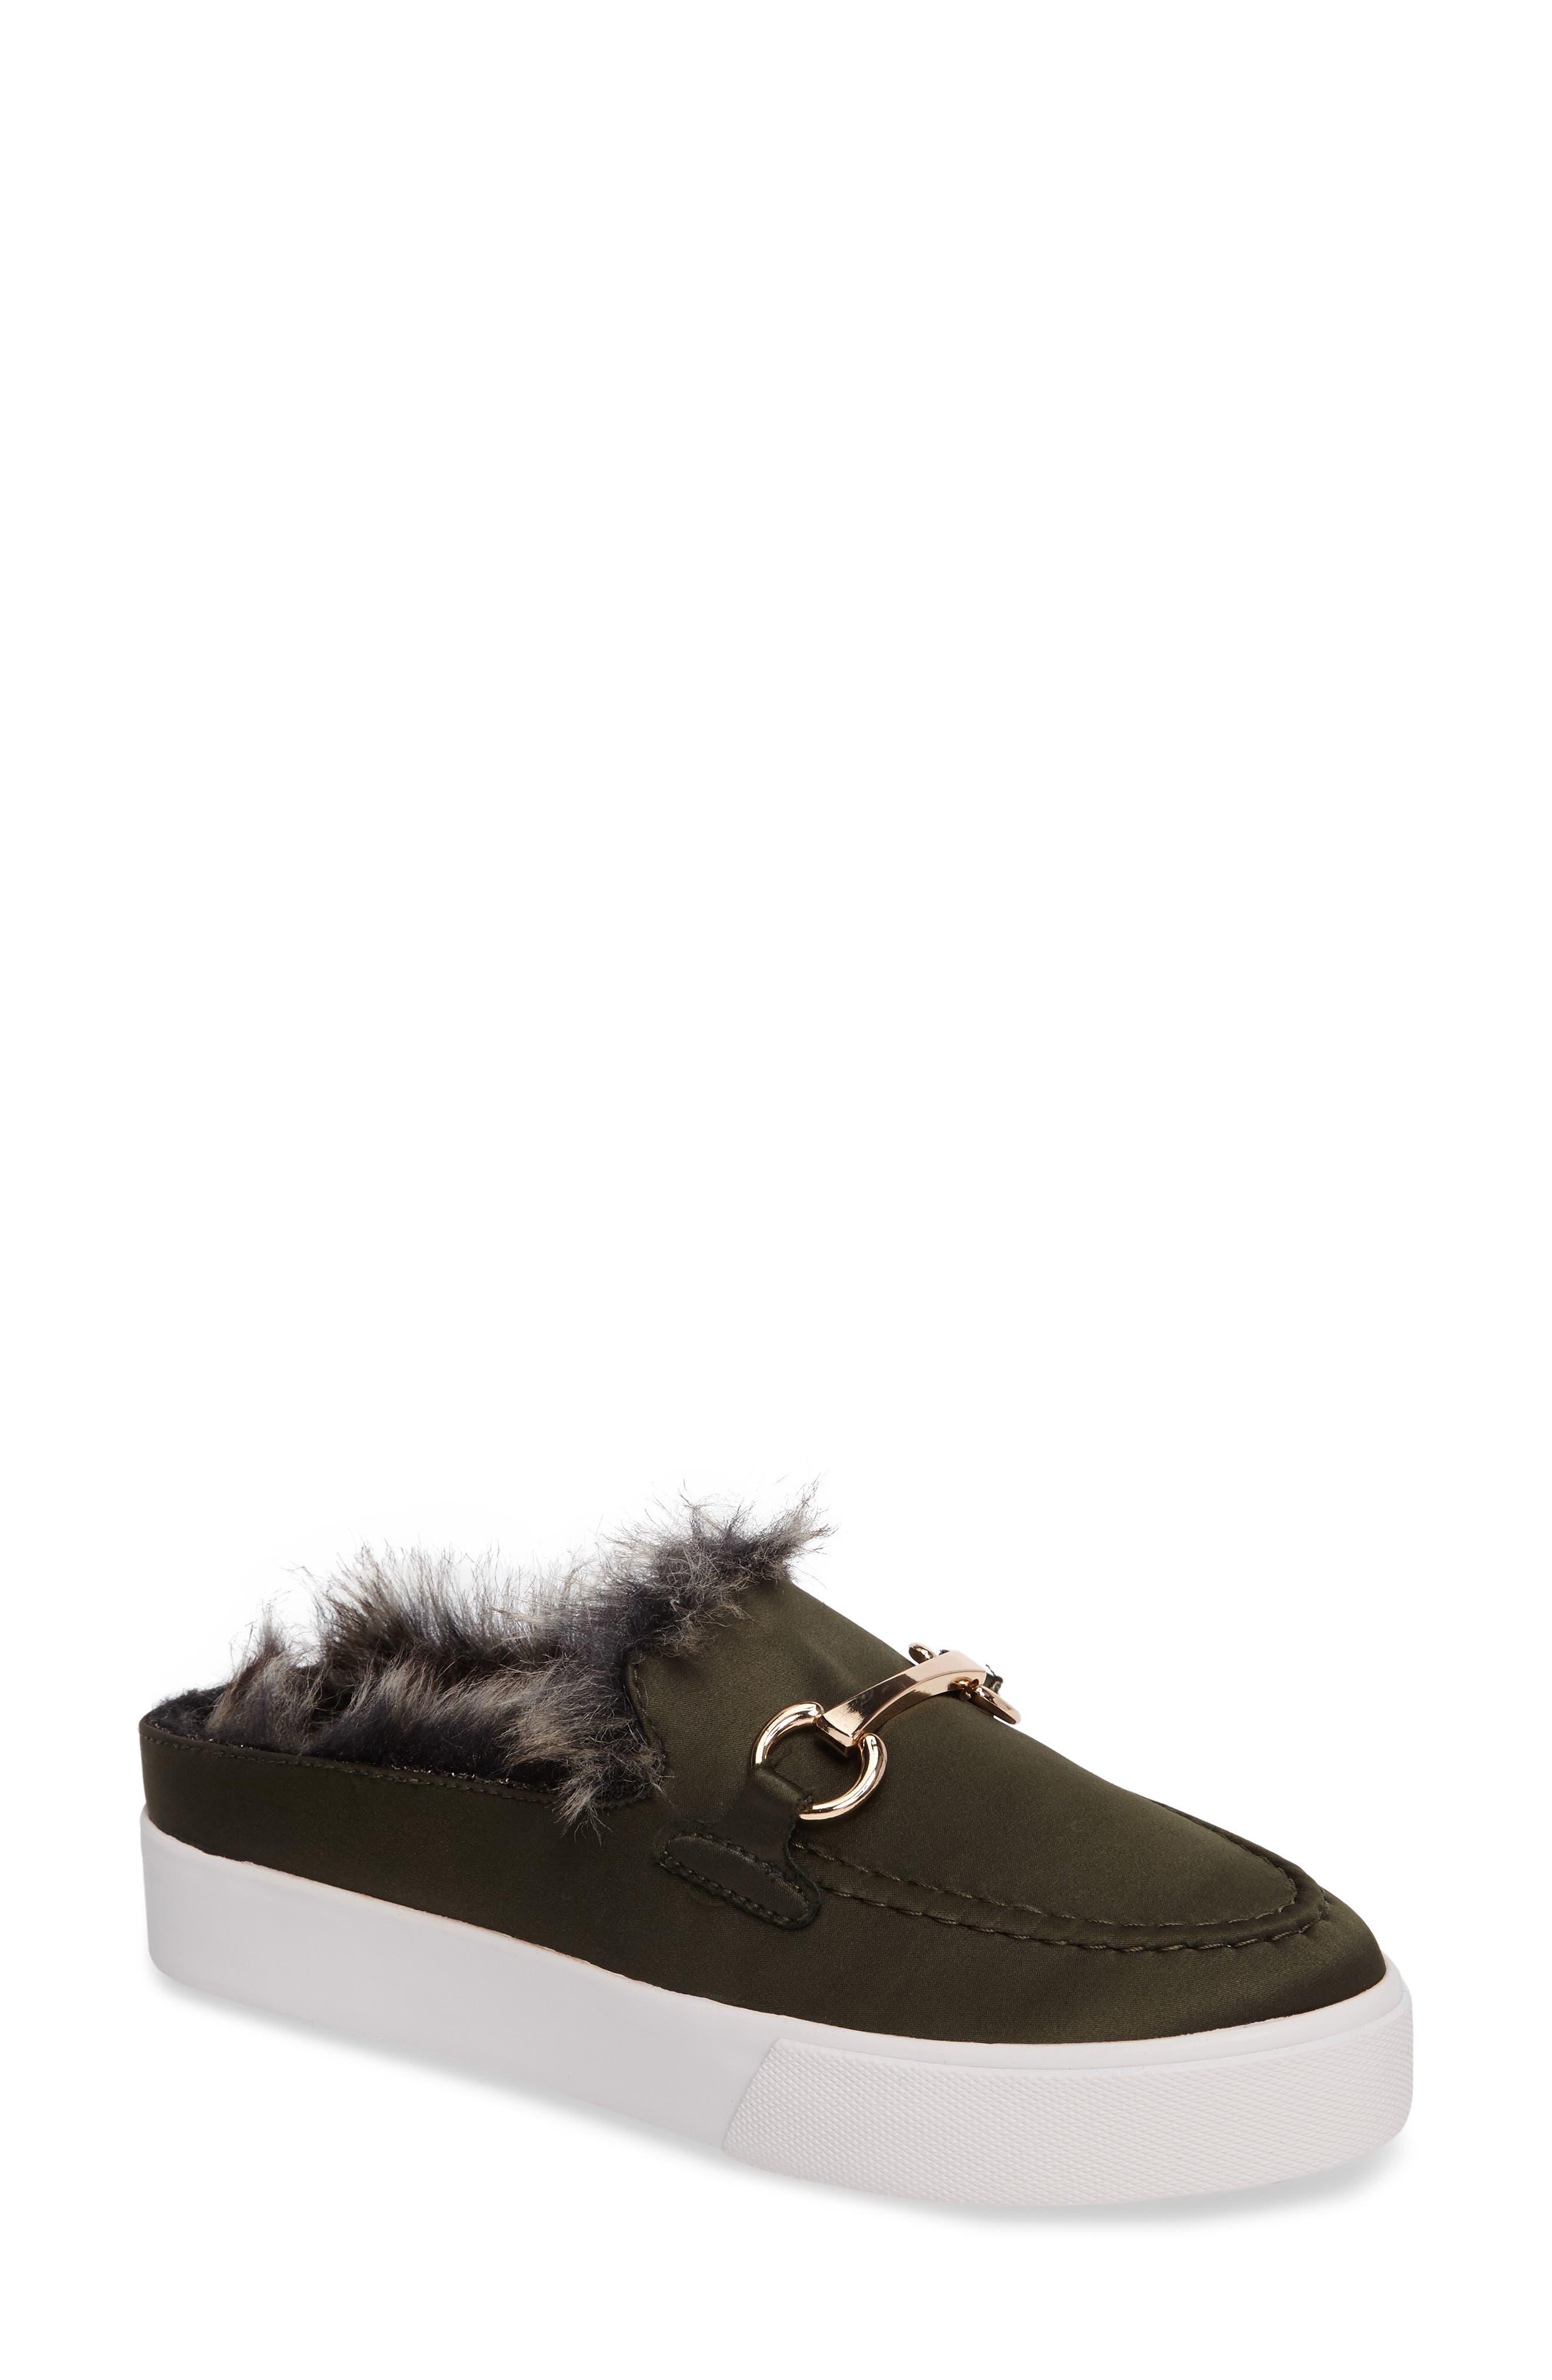 Alternate Image 1 Selected - Jeffrey Campbell Tico Faux Fur Sneaker Mule (Women)